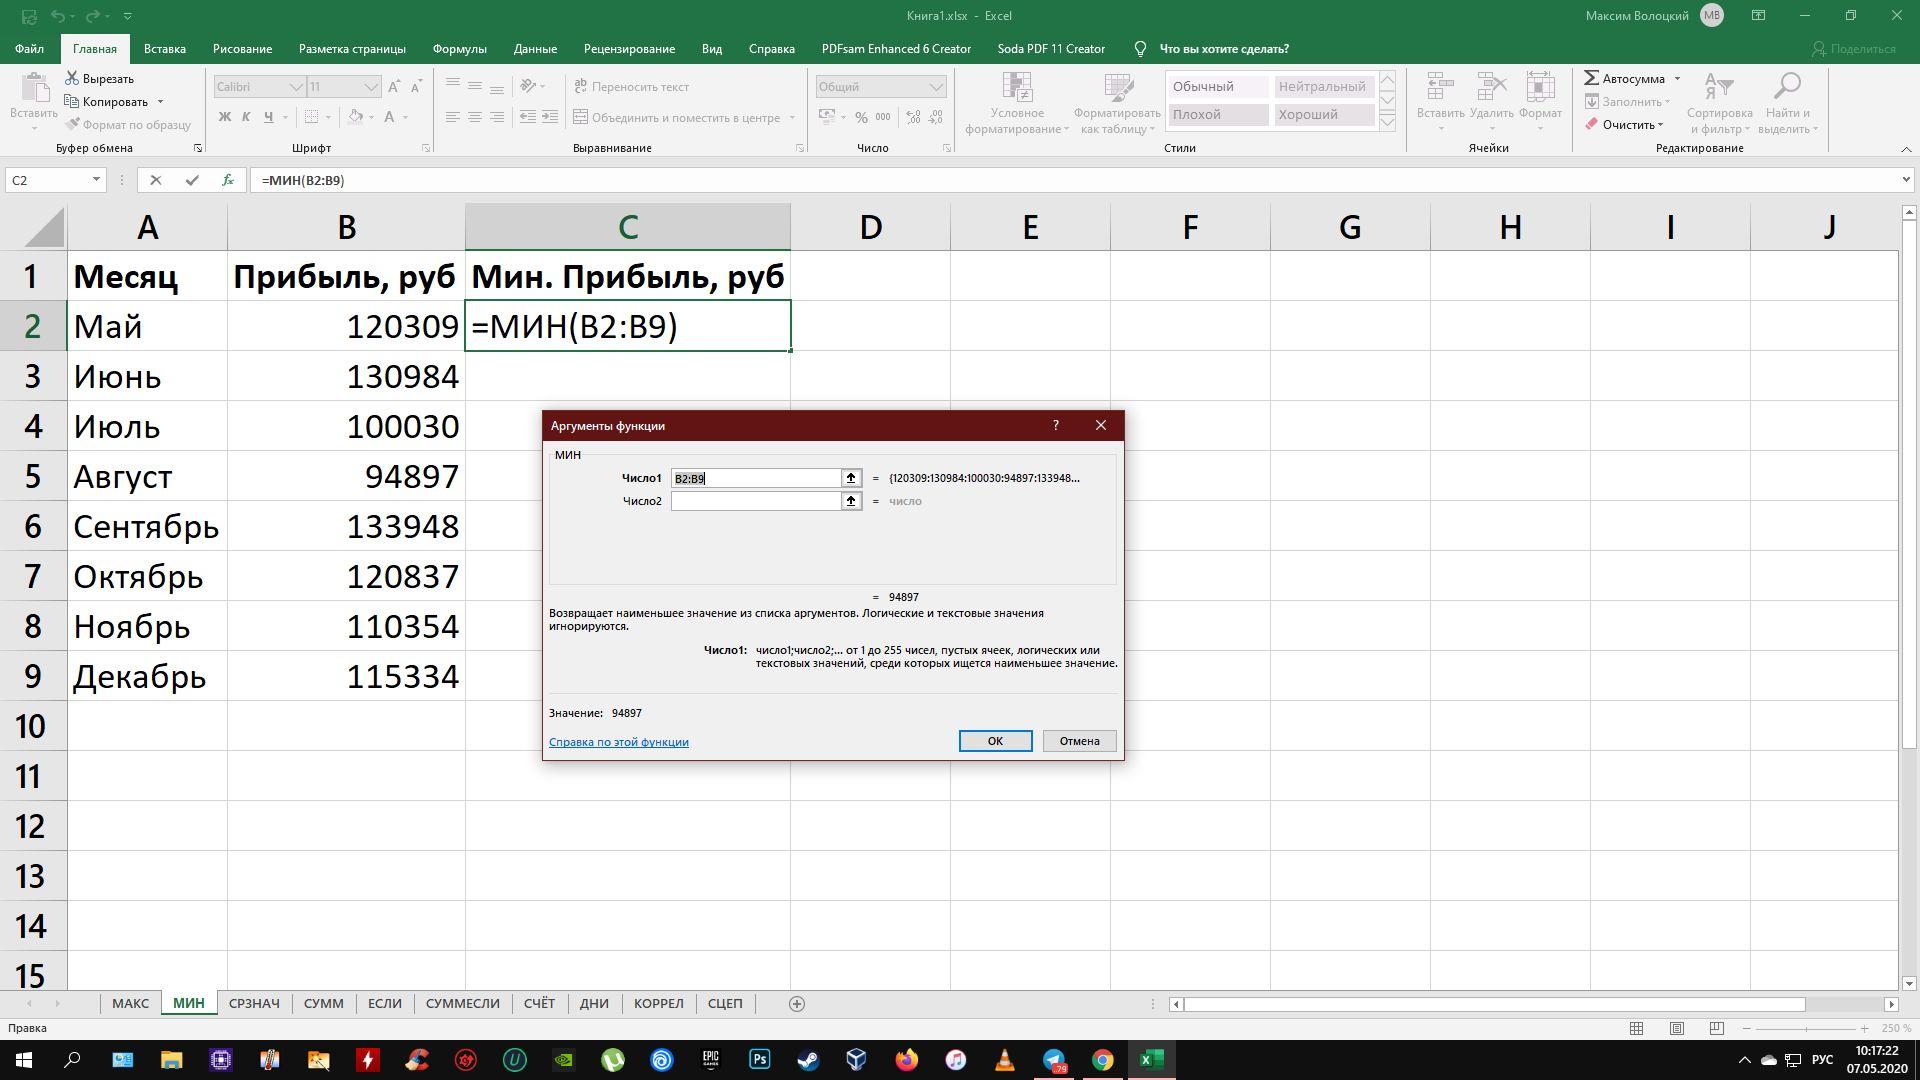 10 formul v excel yak polegshat vam zhittya 2 - 10 формул в Excel, які полегшать вам життя